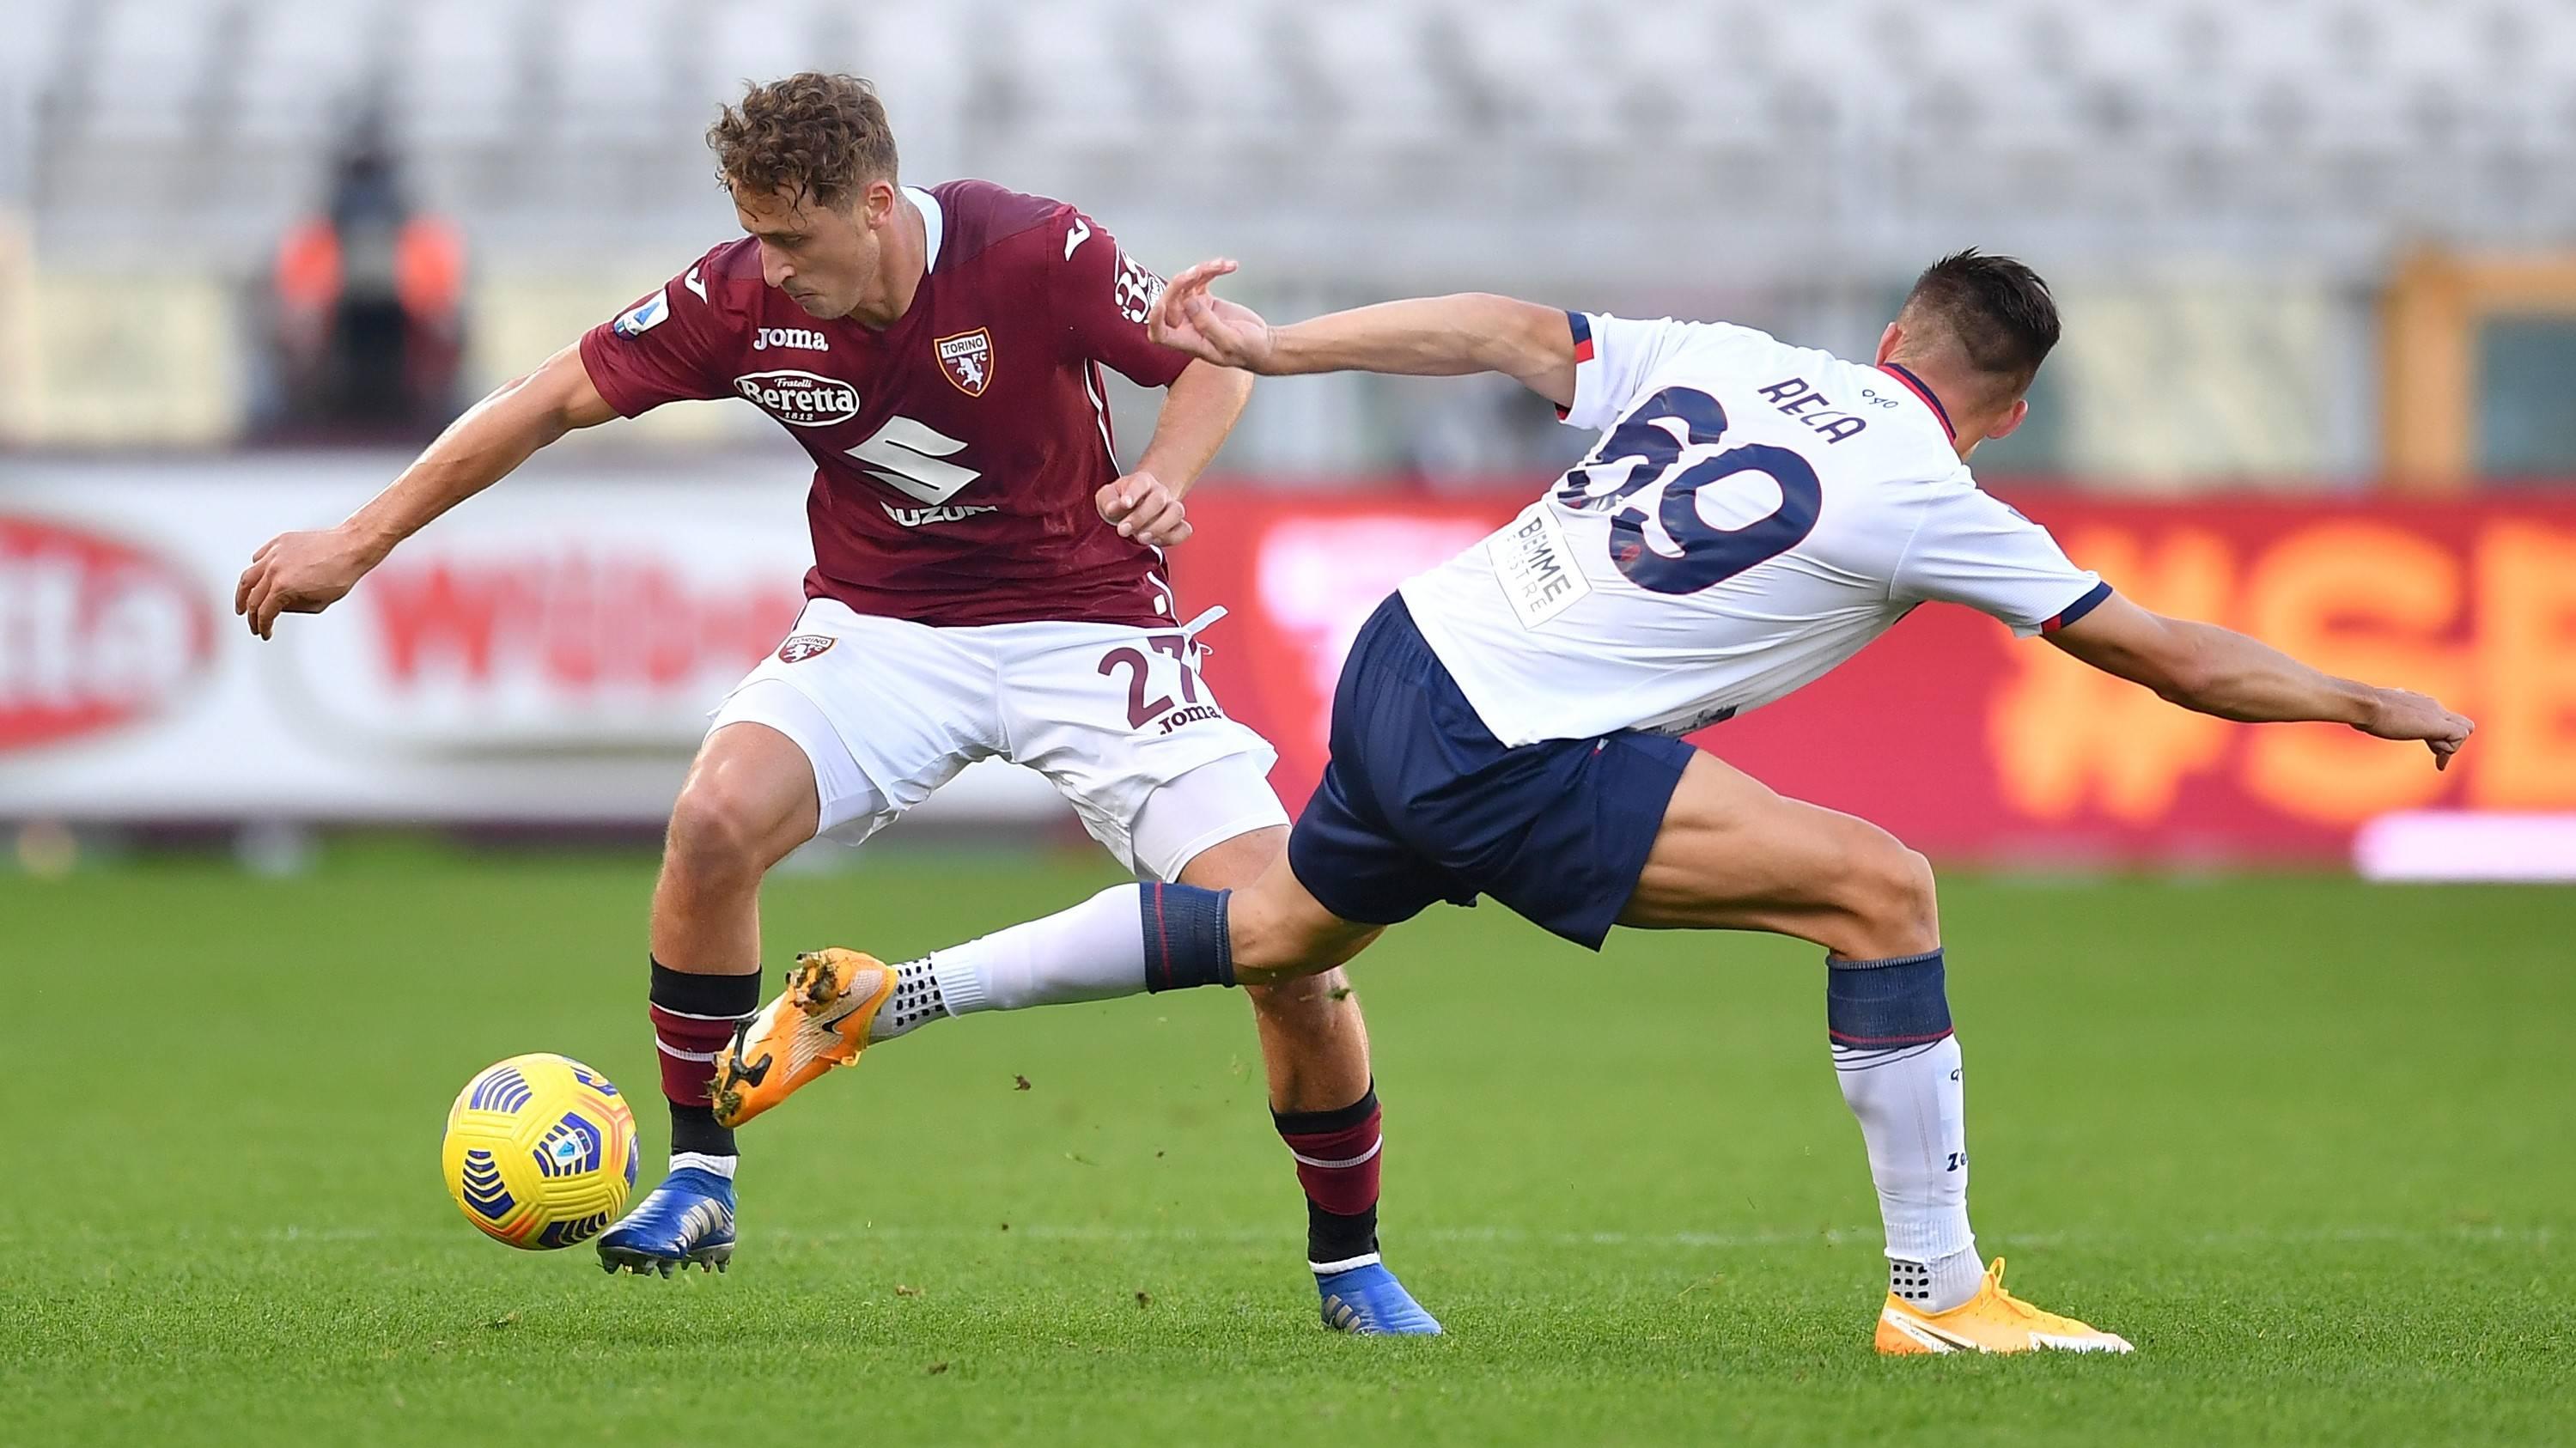 Watch Torino v Crotone Live Stream | DAZN IT